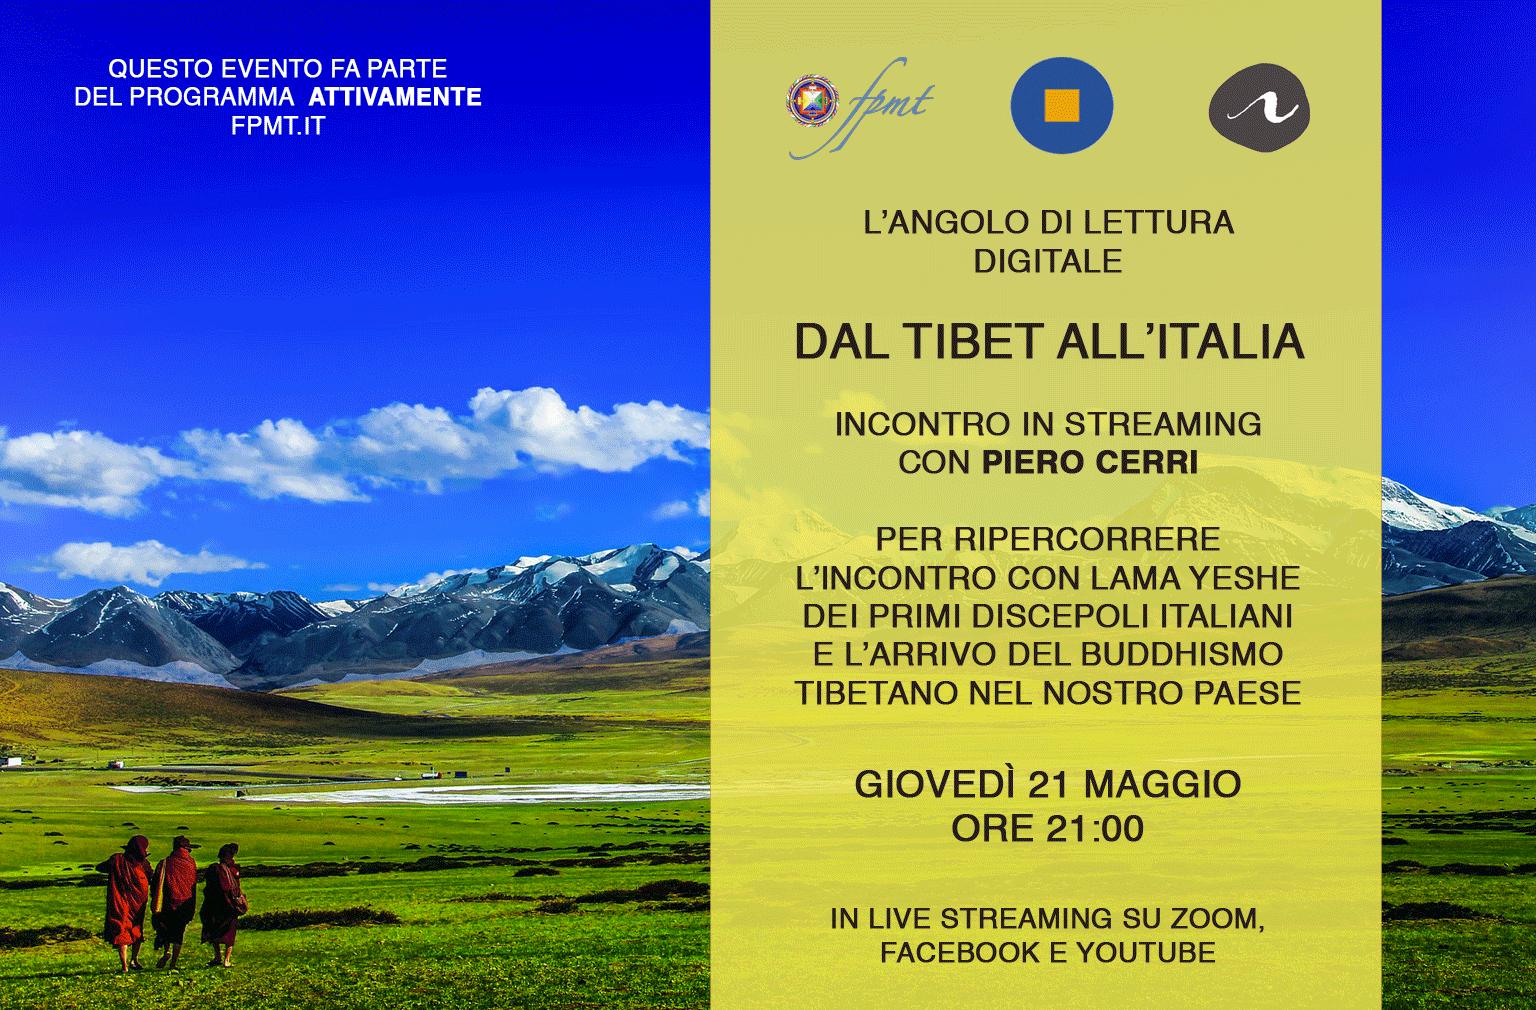 Dal Tibet all'Italia